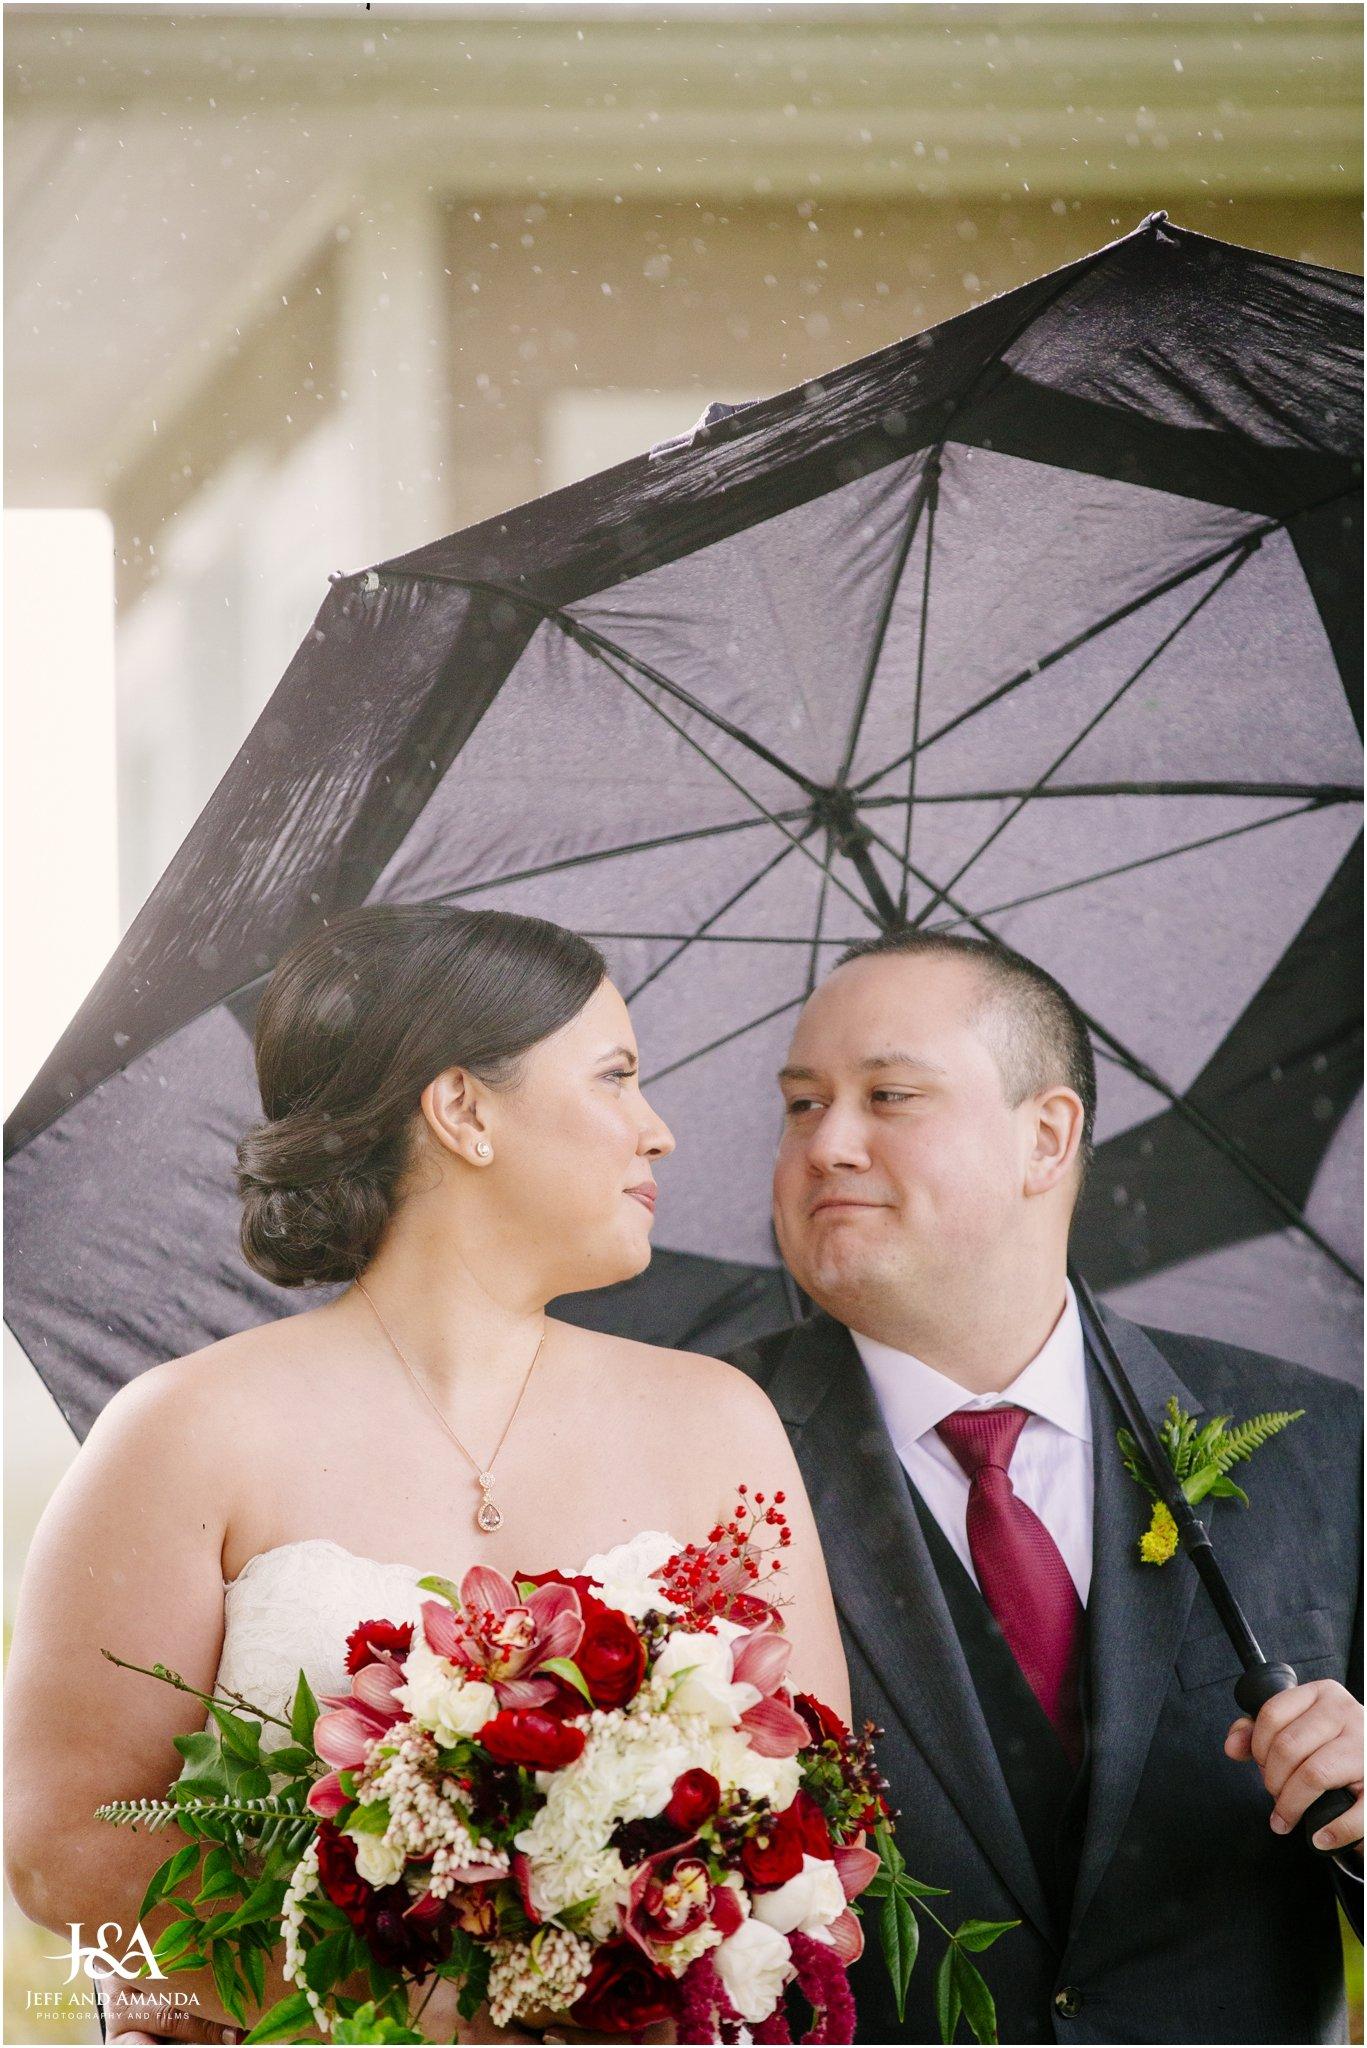 Dave and Kari s Wedding-Facebook Ready-0177.jpg